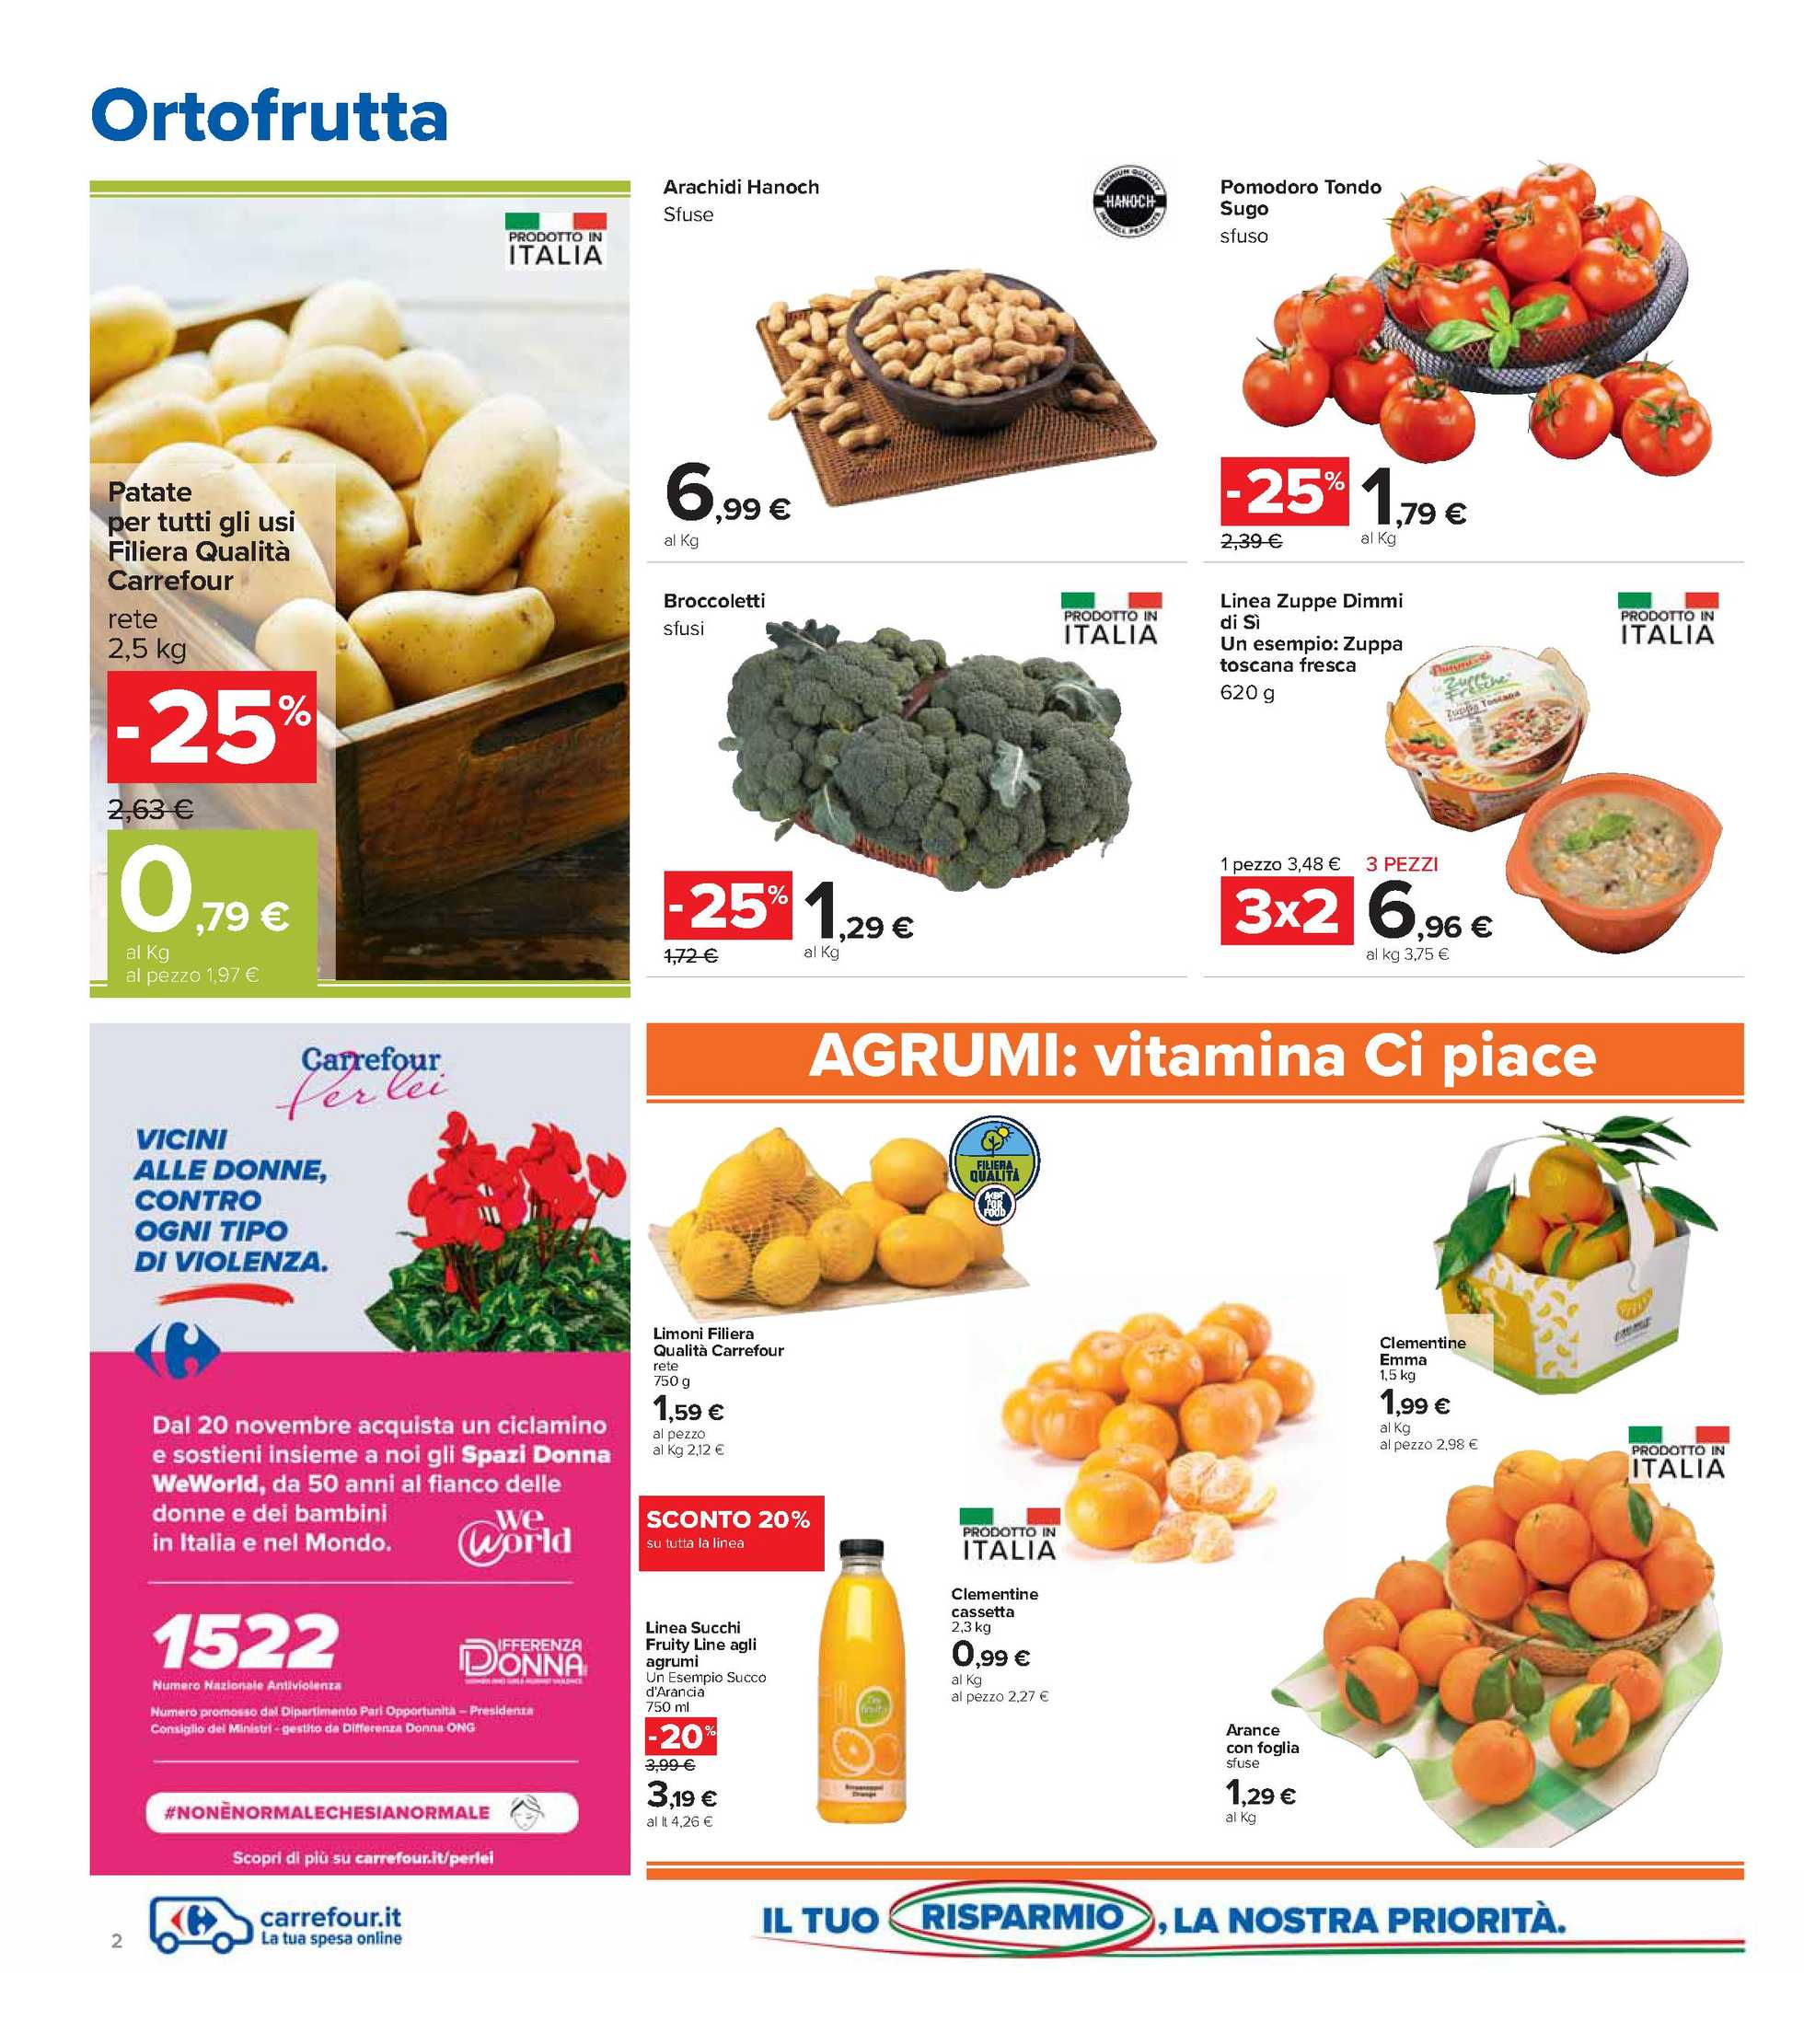 Carrefour Iper - offerte valide dal 20.11.2020 al 30.11.2020 - pagina 2.